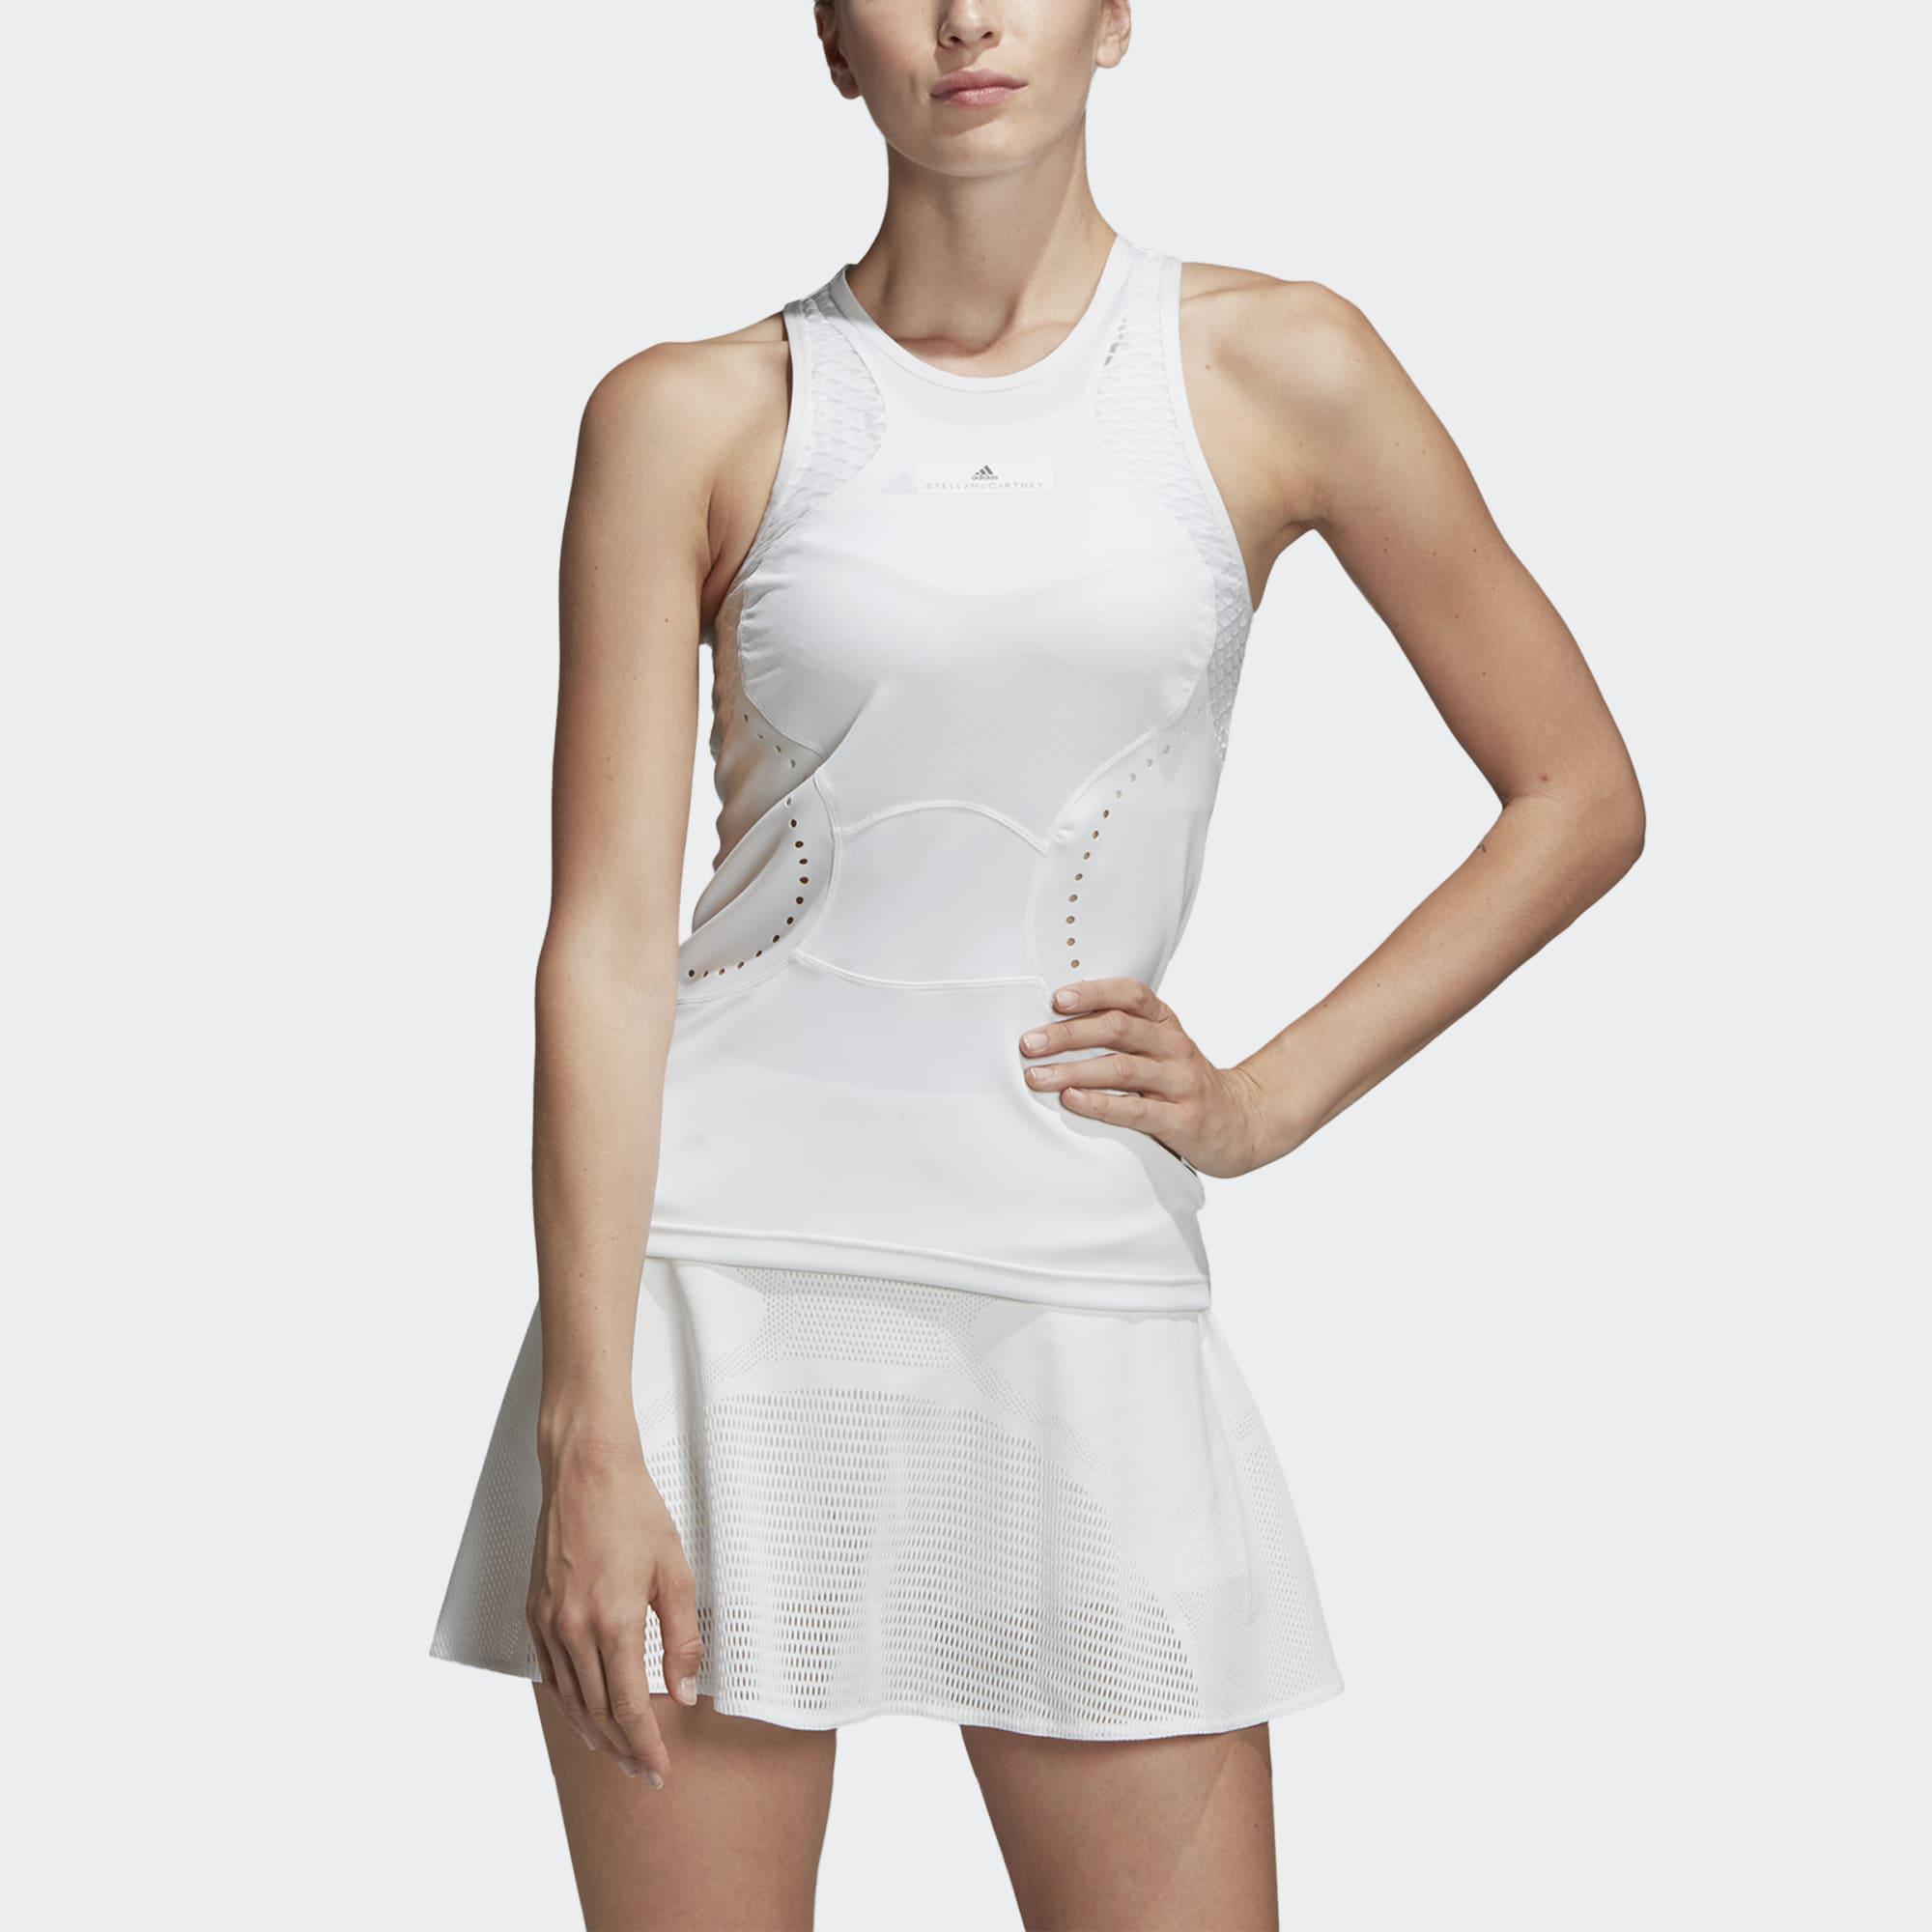 f3db38510ec Adidas Womens Stella McCartney Q3 Tank - White - Tennisnuts.com